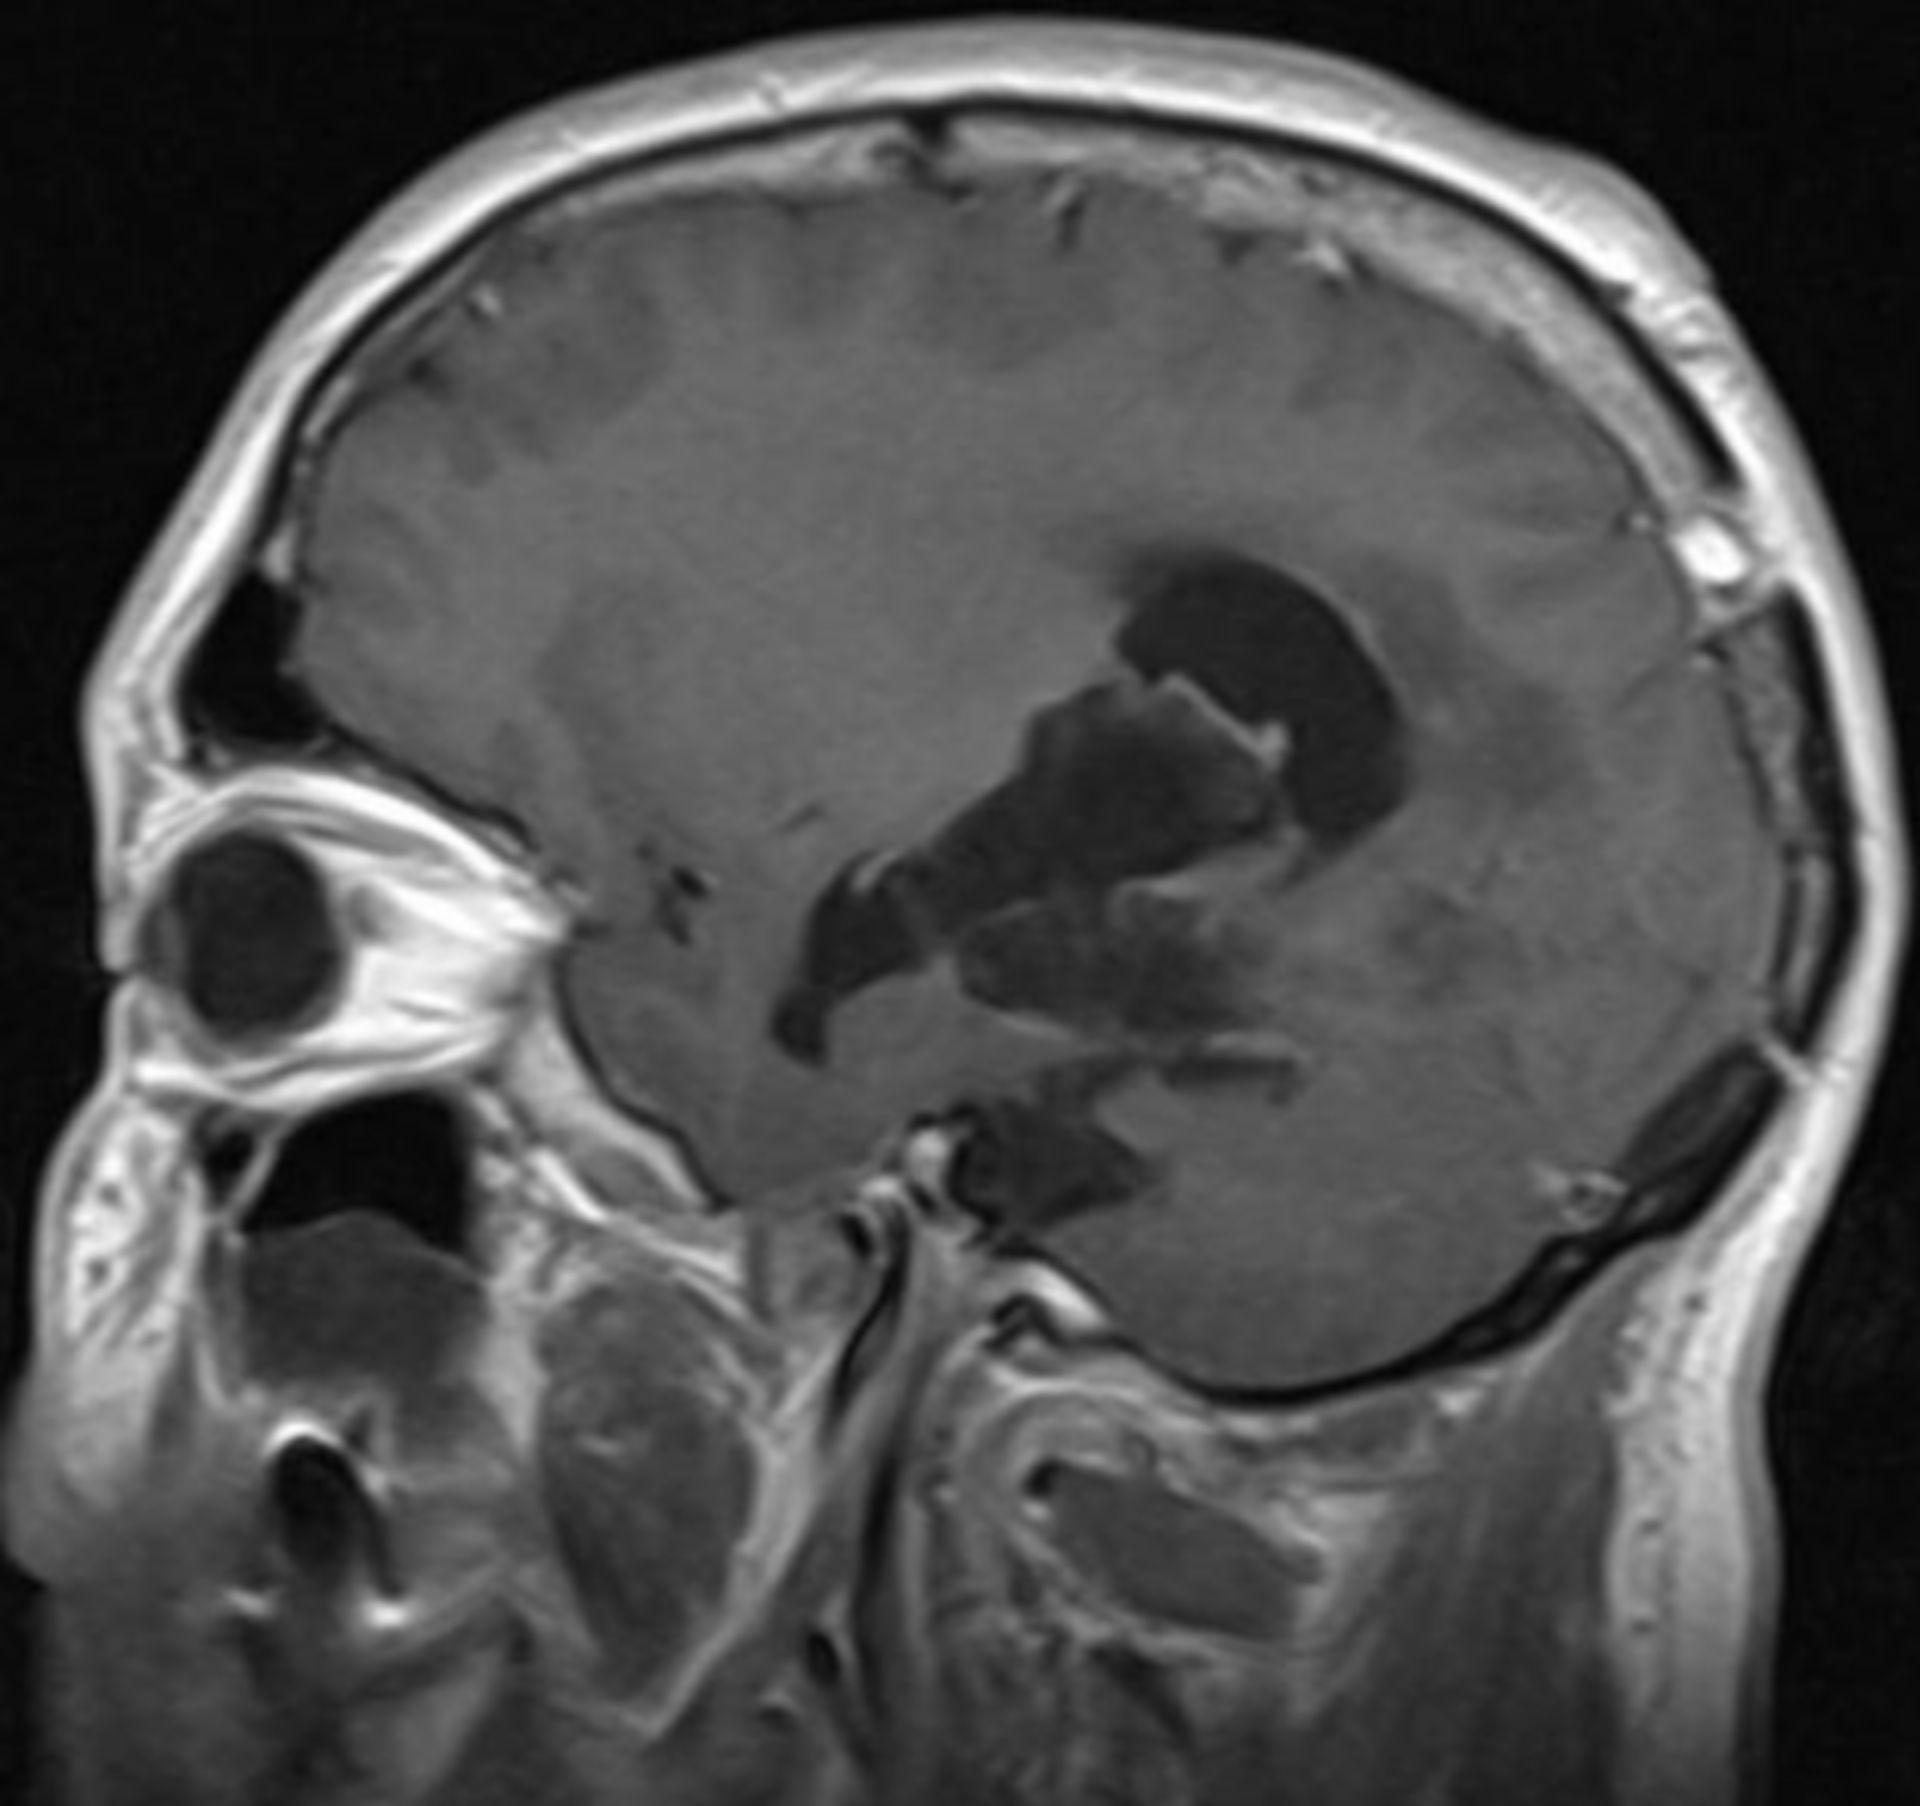 Quiste epidermoide supra-e infratentorial - cMRI sagital con medio de contraste